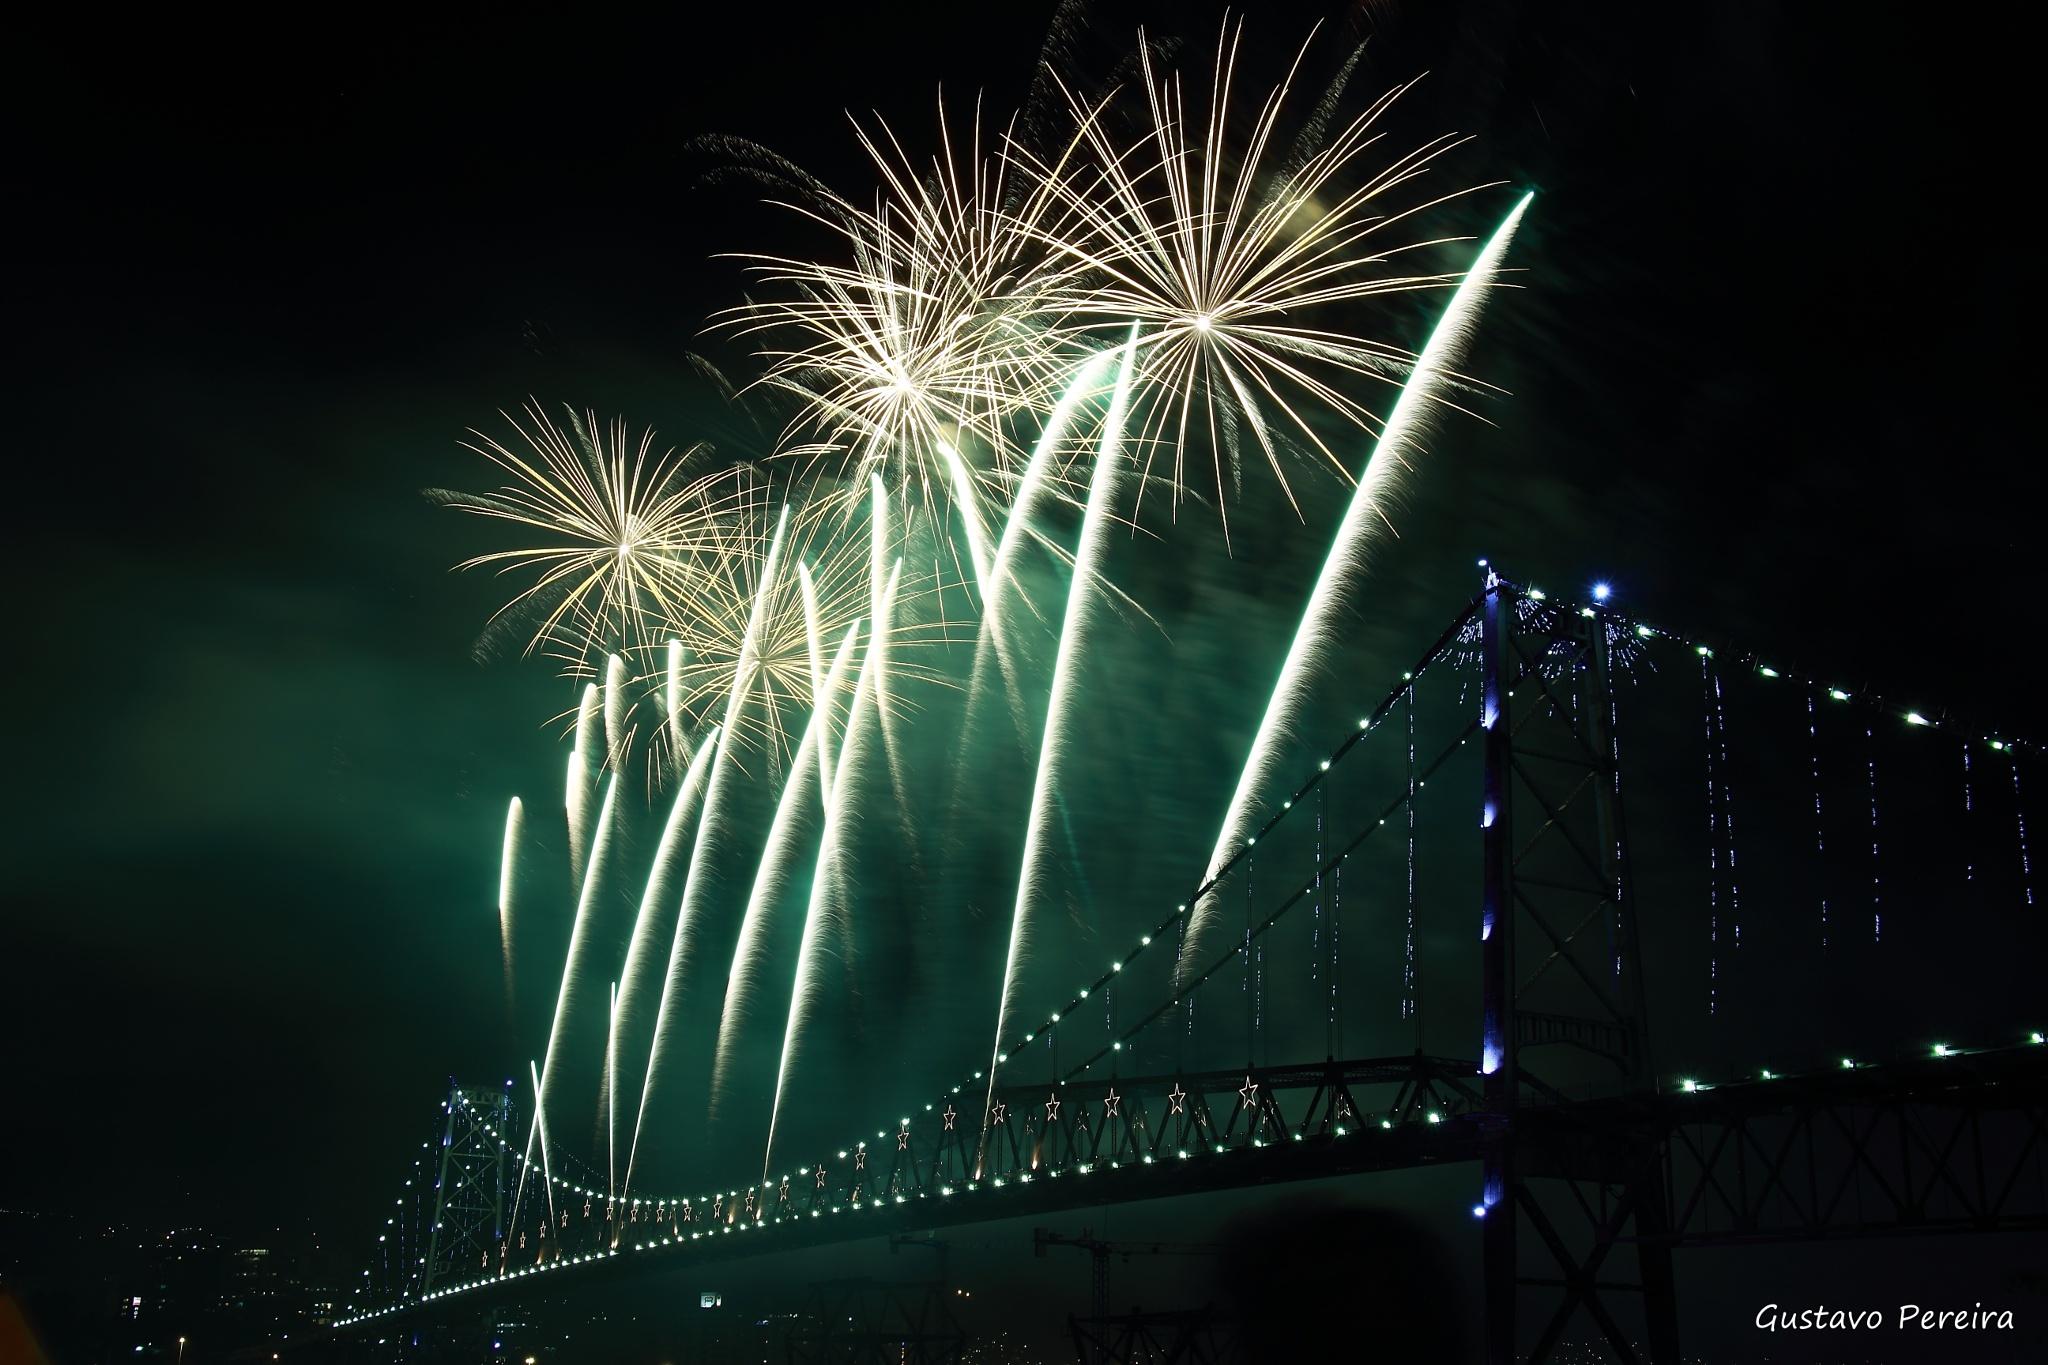 The celebrating bridge. by Gustavo Pereira